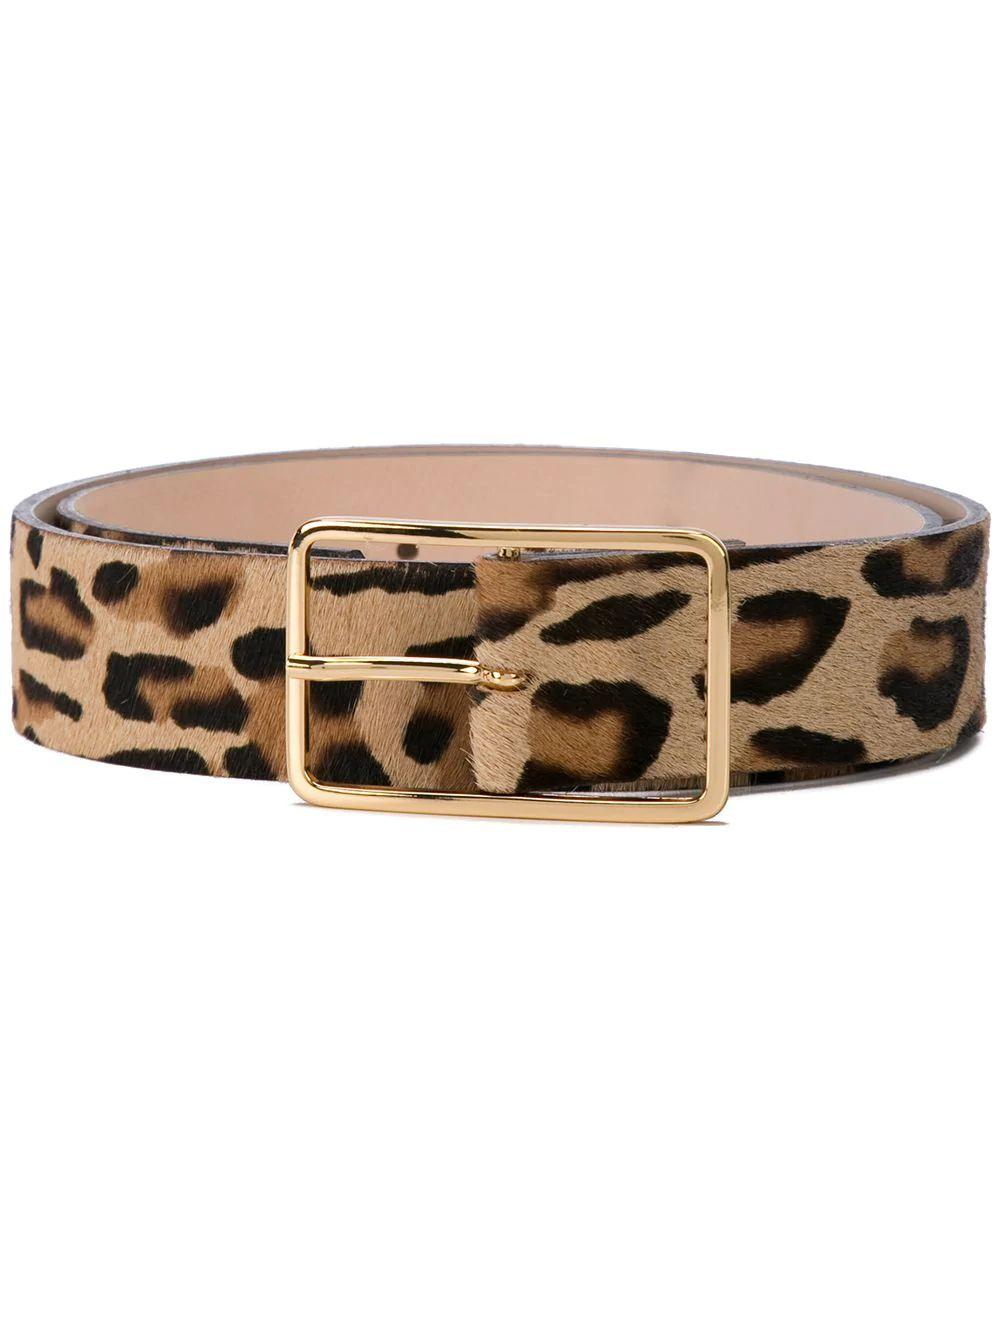 Milla Leopard Belt Item # BT1870-SP21